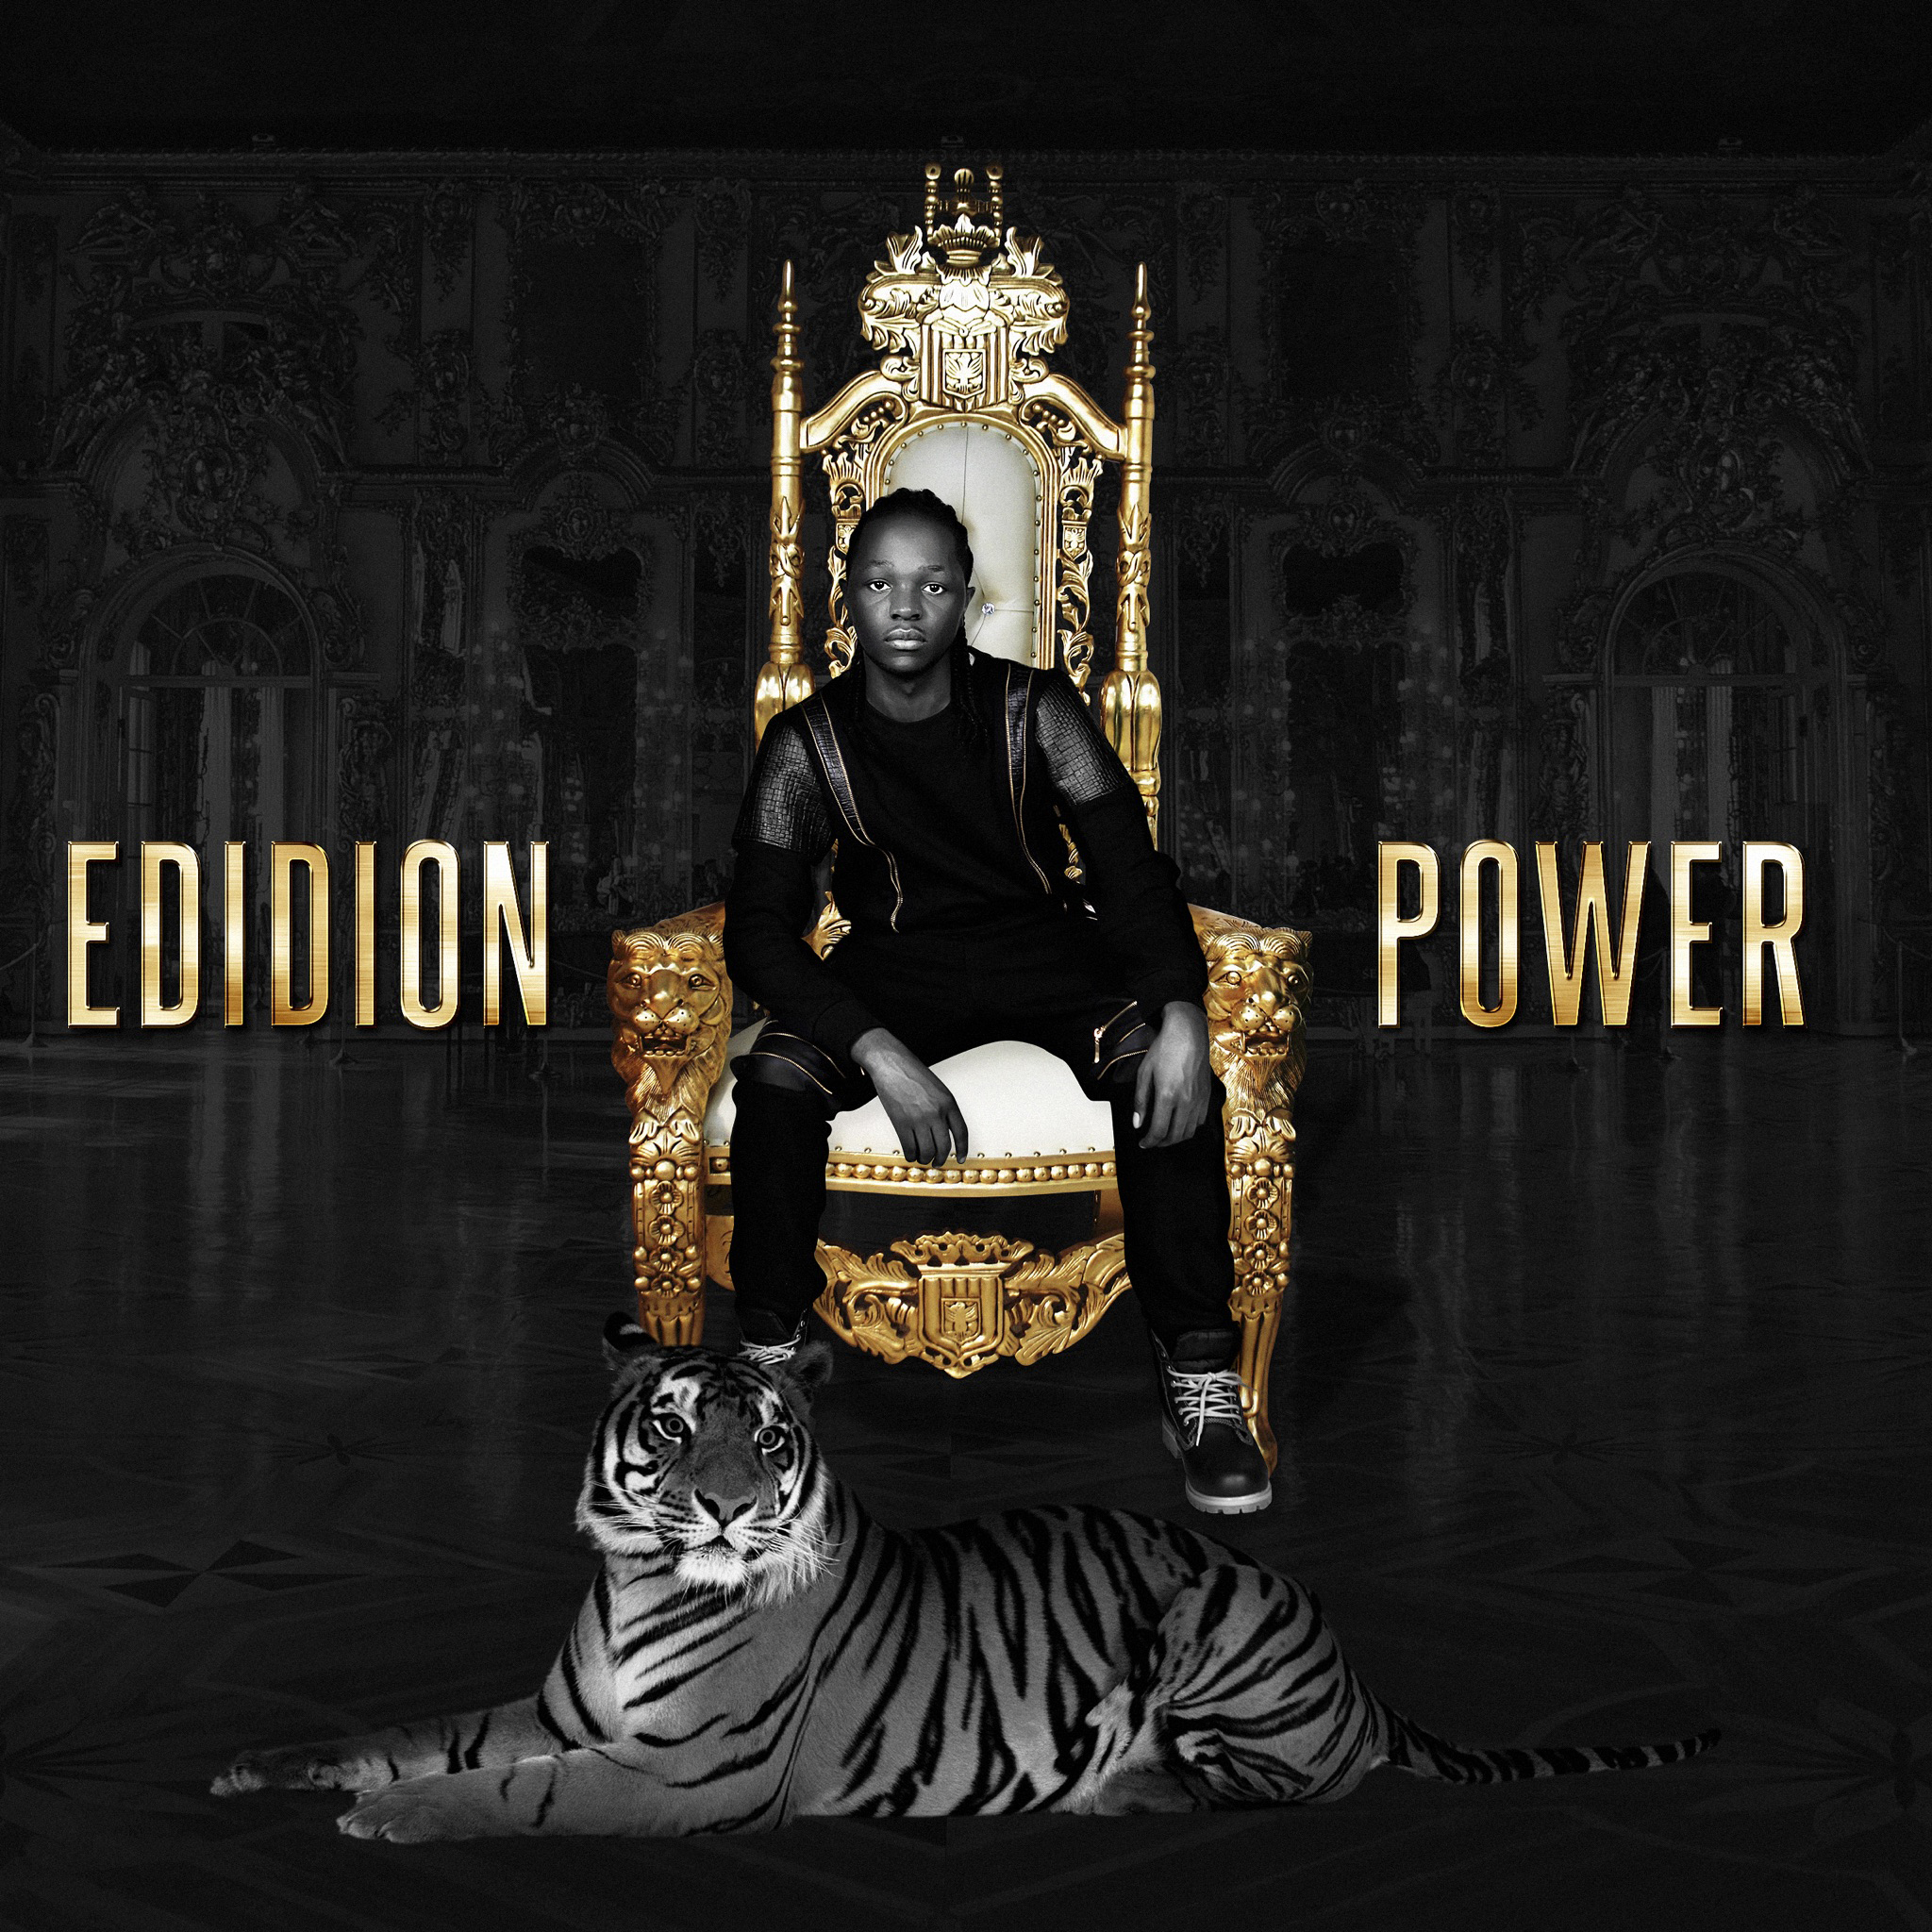 Edidion Power Single Artwork.jpg